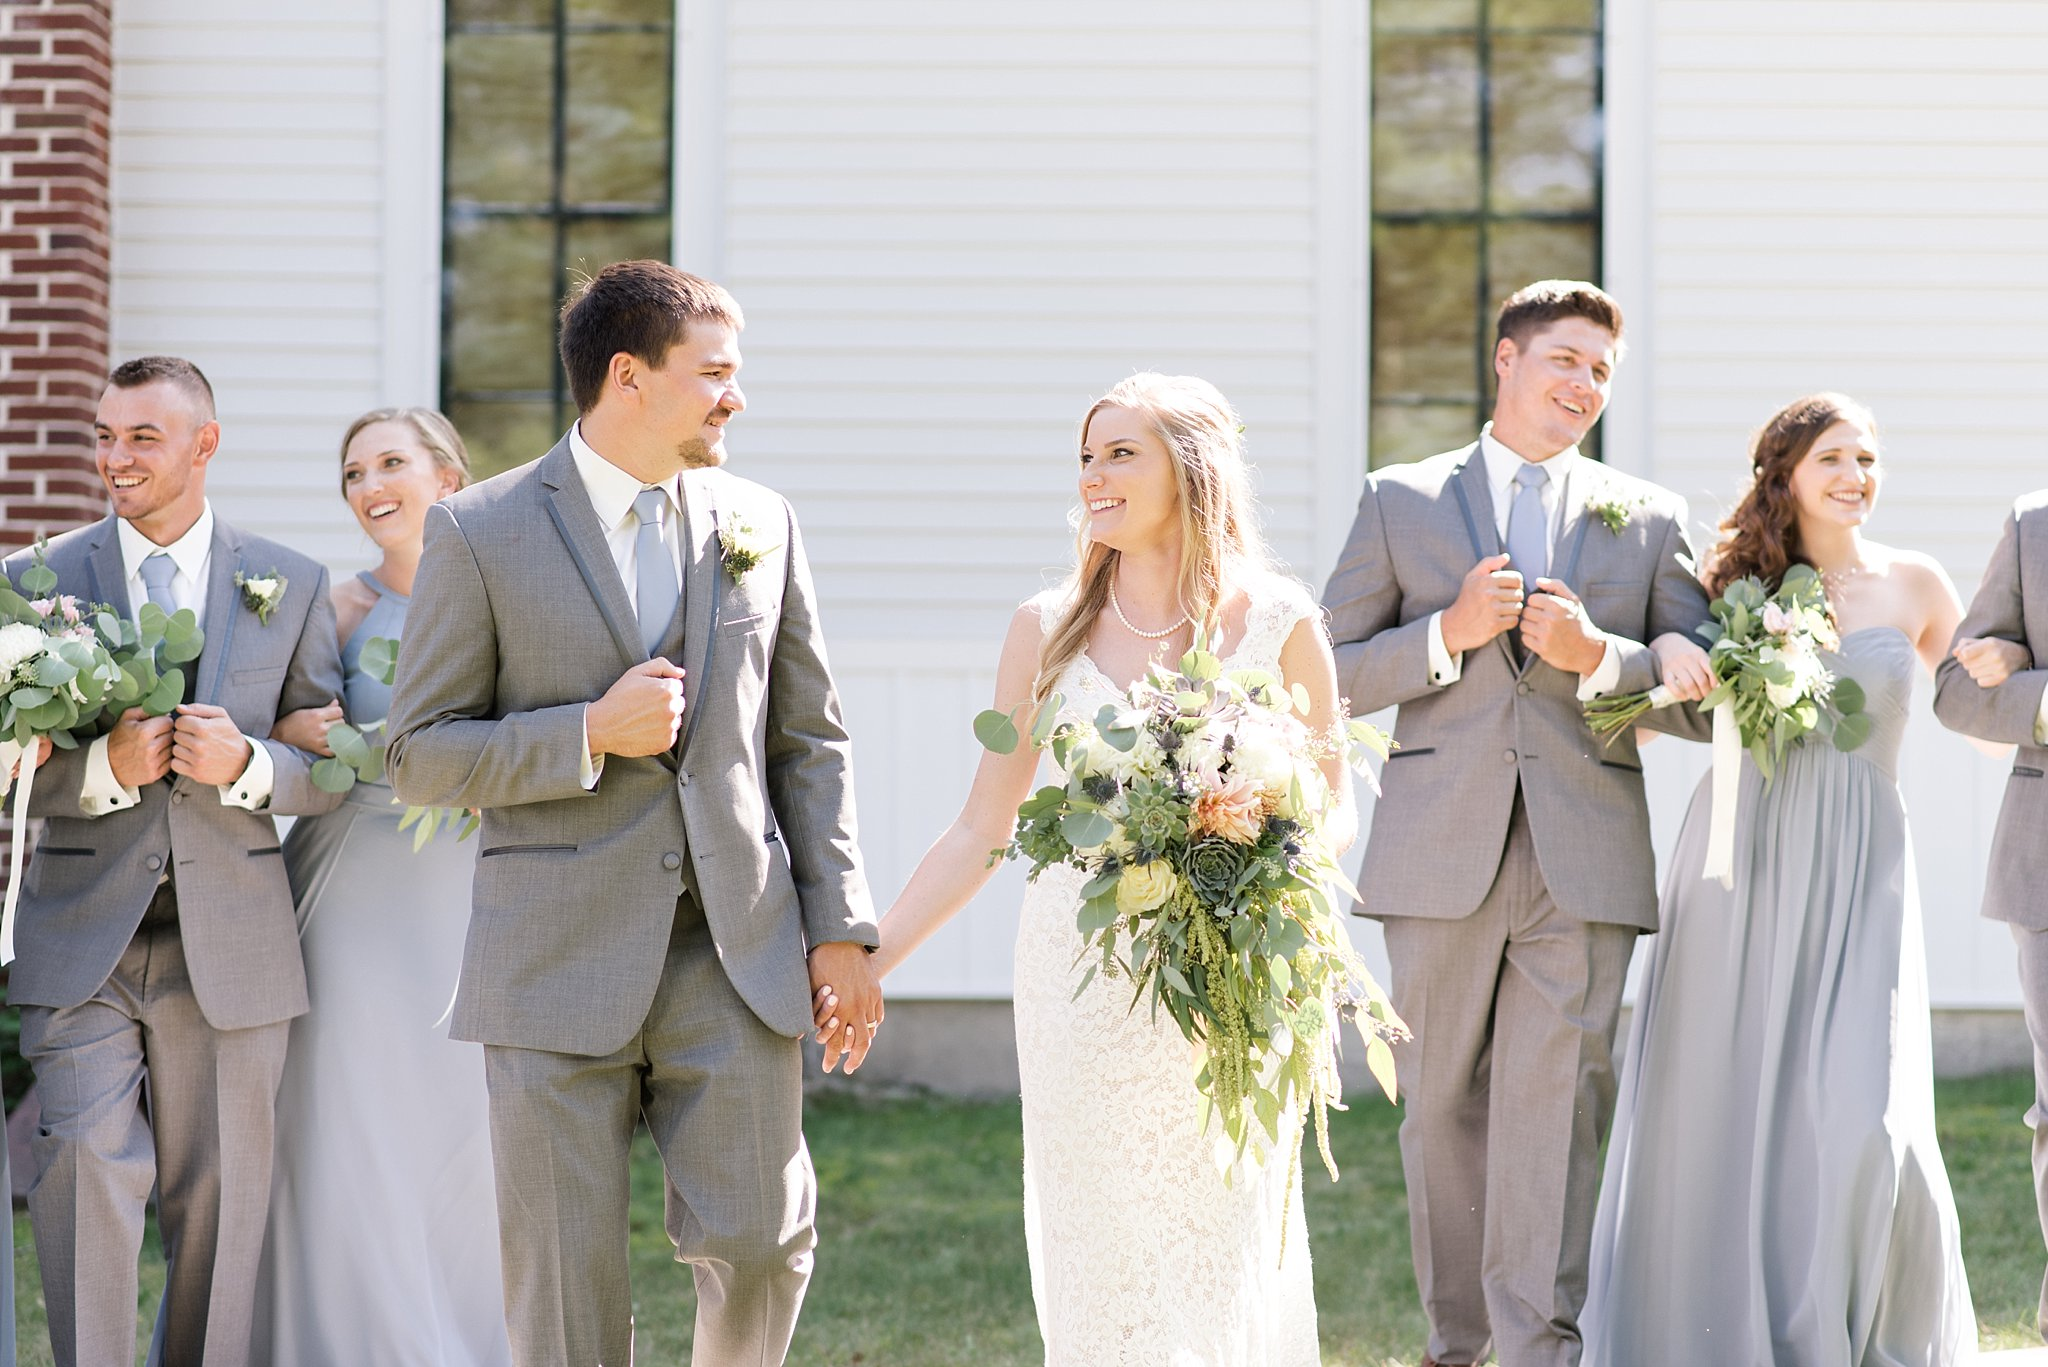 Cadillac-Michigan-wedding-caberfae-peaks-milwaukee-photographer_0043.jpg